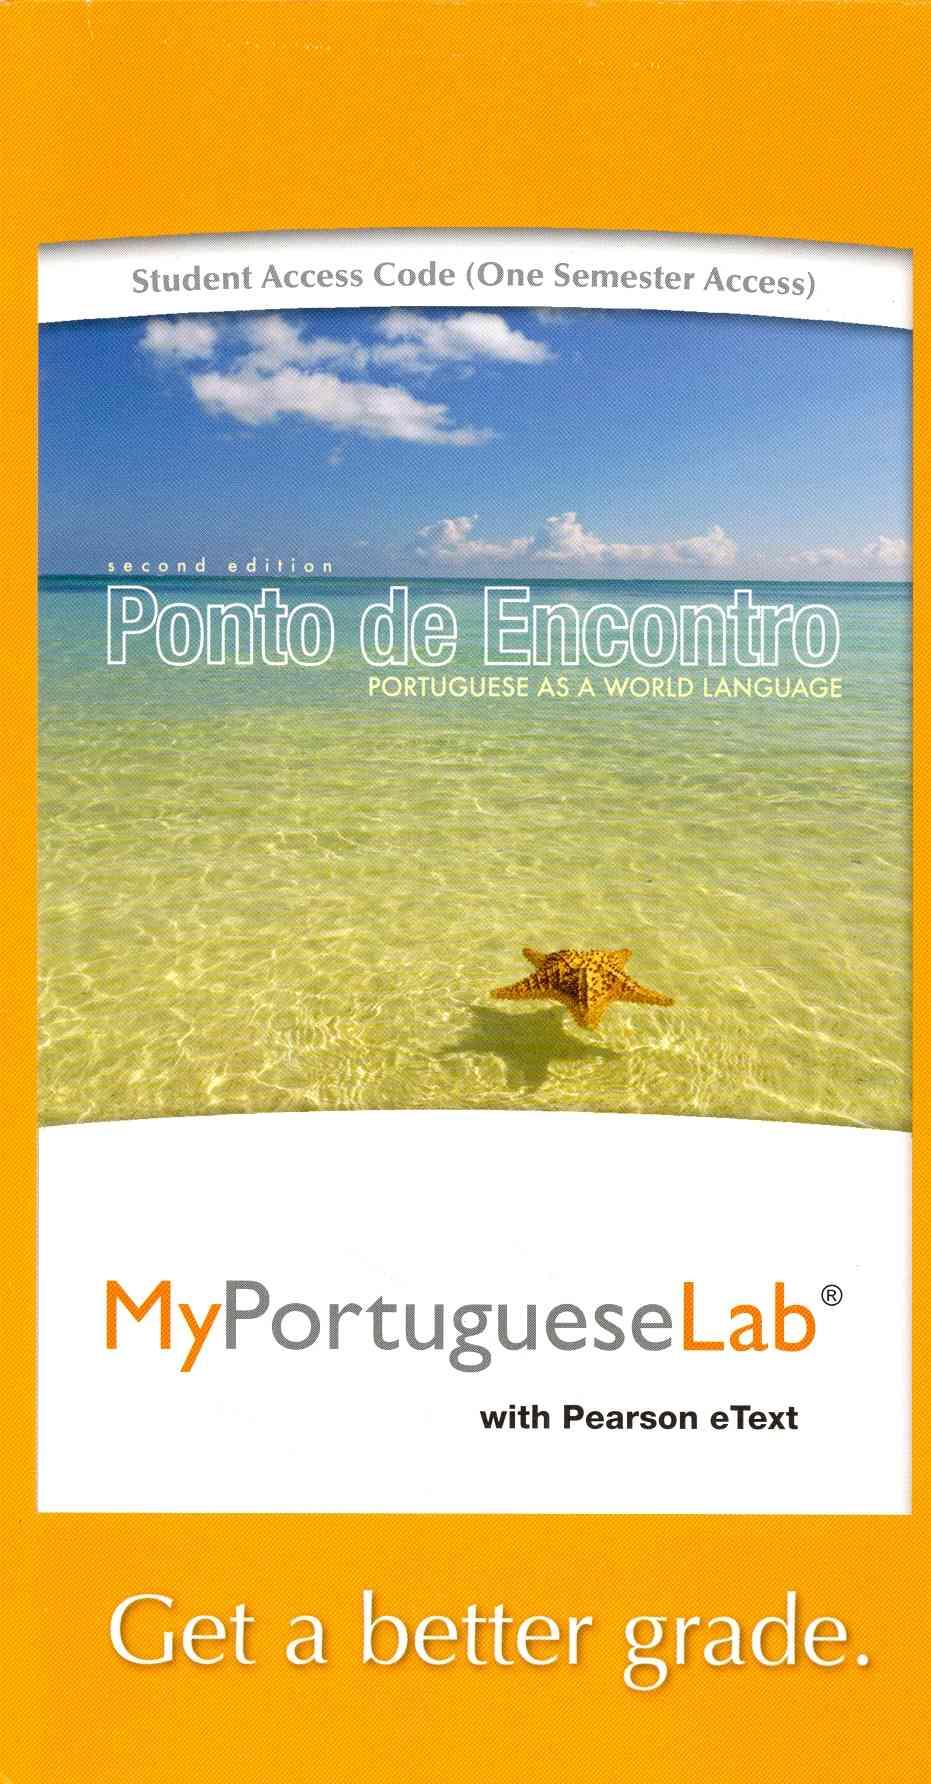 Ponto De Encontro Myportugueselab With Pearson Etext Access Card By De Joudt-PastrT, ClTmence/ Klobucka, Anna/ Sobral, Patrfcia Isabel/ Moreira, Maria Luci De Biaji/ Hutchinson, AmTlia P.